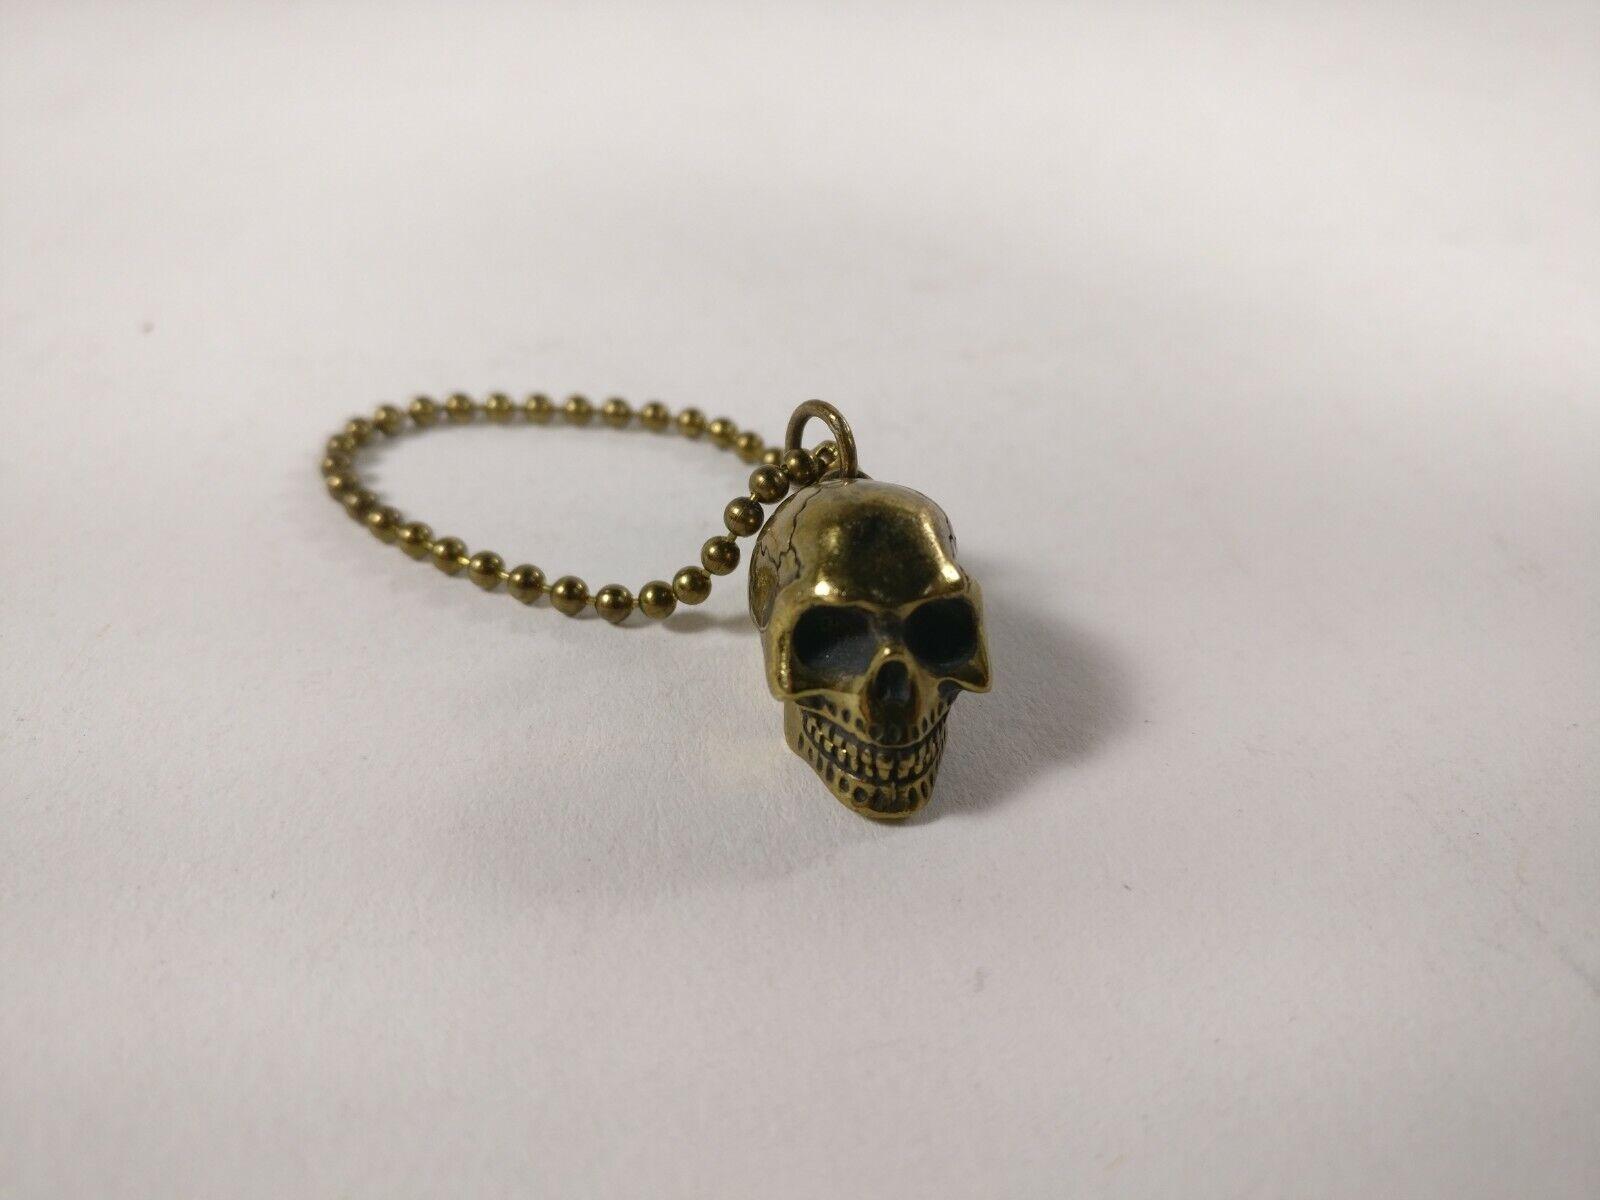 Secret Base Chaos Brass Skull Keychain 3 4